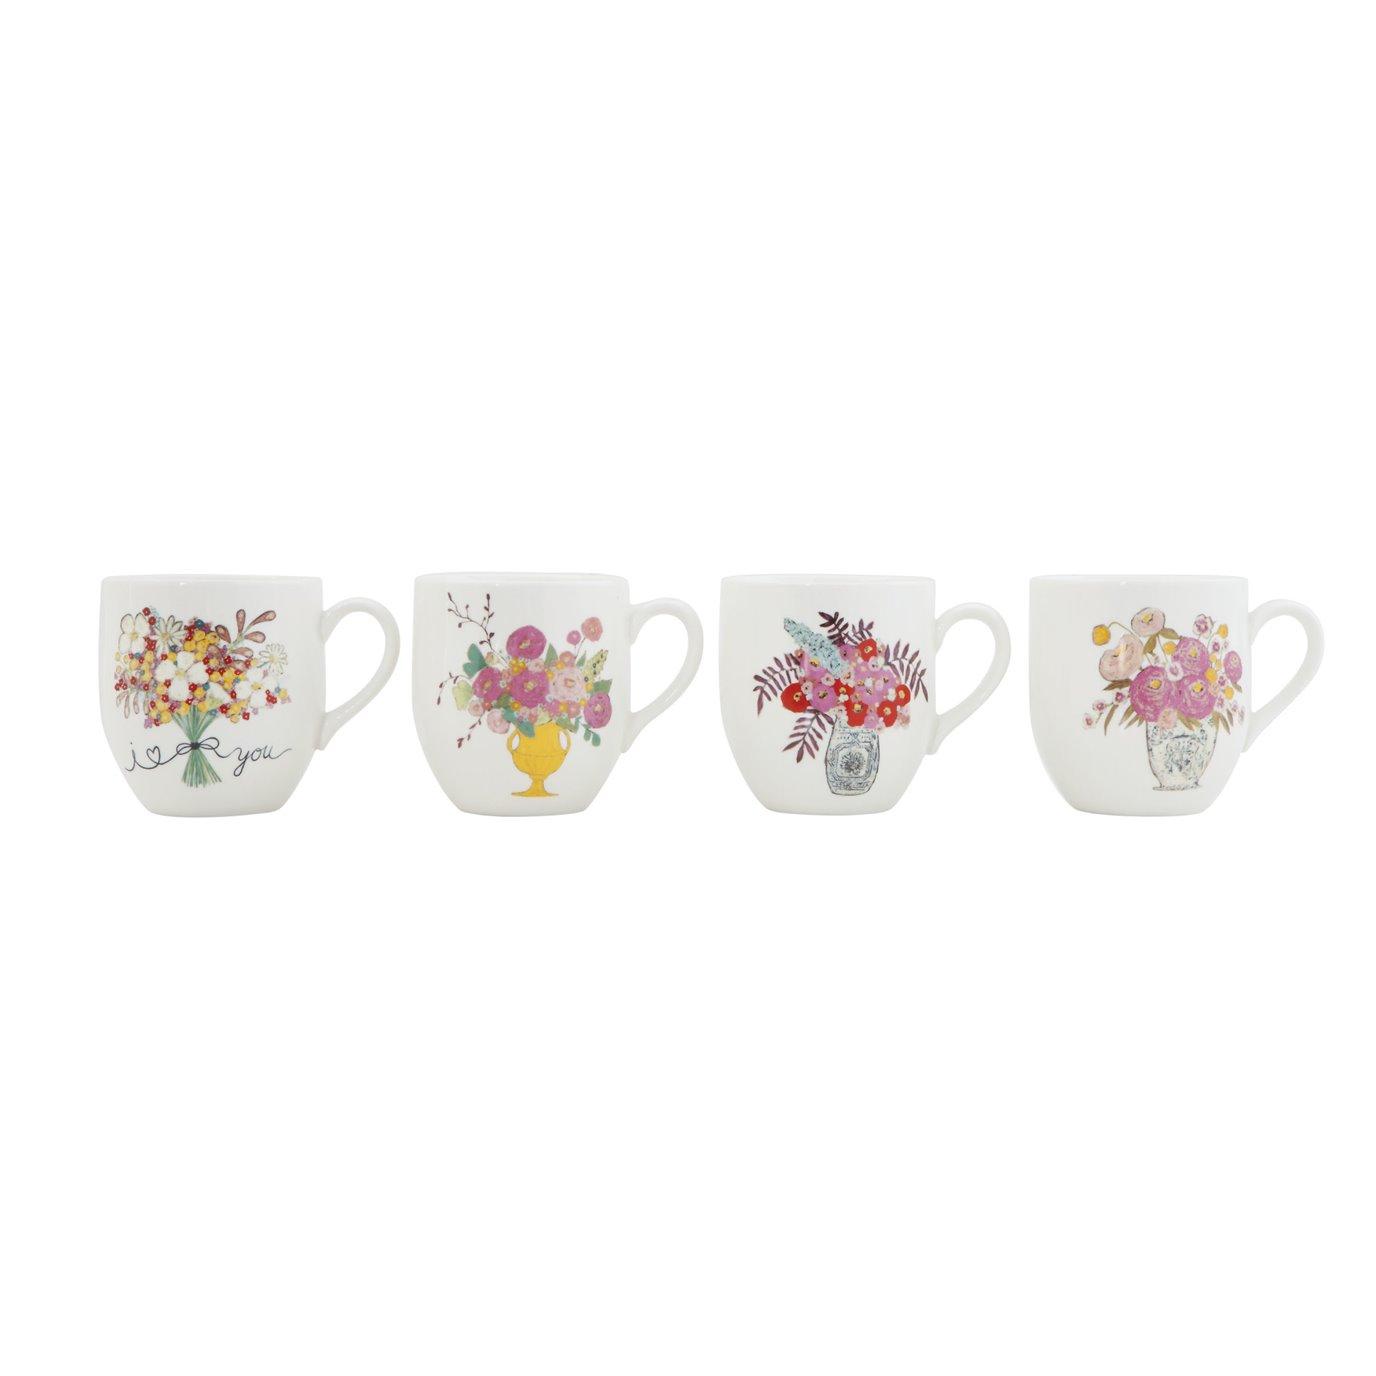 """I Love You"" Flower Bouquet Stoneware Mugs (Set of 4 Designs)"